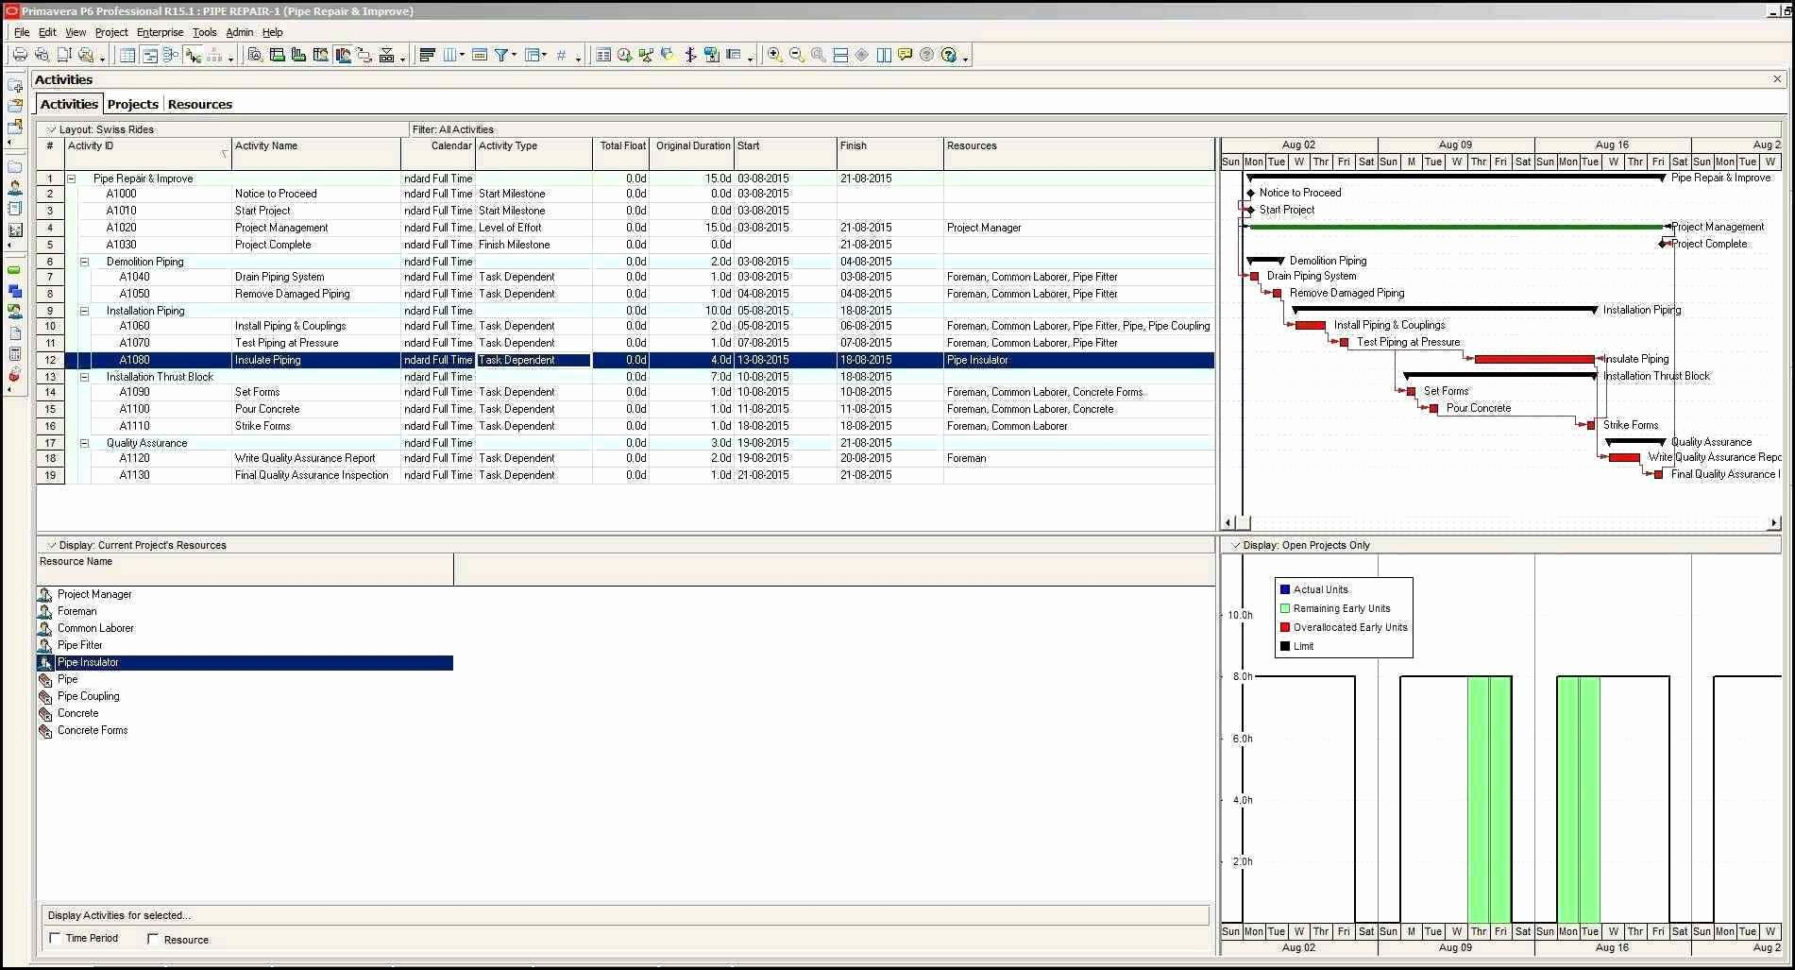 Coupon Database Spreadsheet Pertaining To Coupon Database Spreadsheet Also Raymond 20R30Tt Manual Ebook